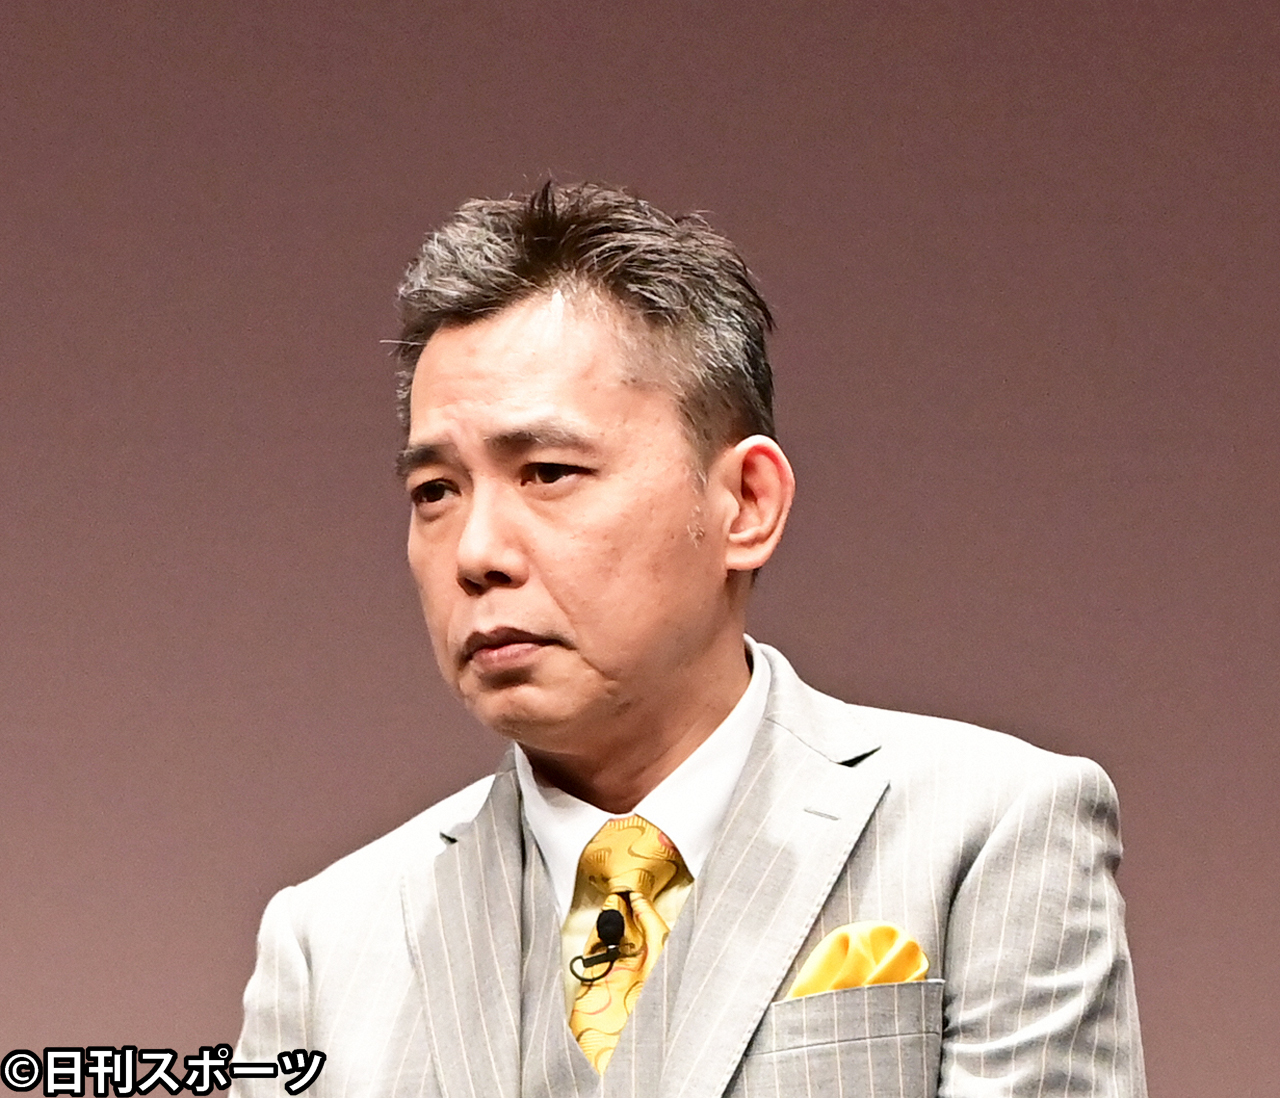 爆笑問題の太田光(2021年2月27日撮影)